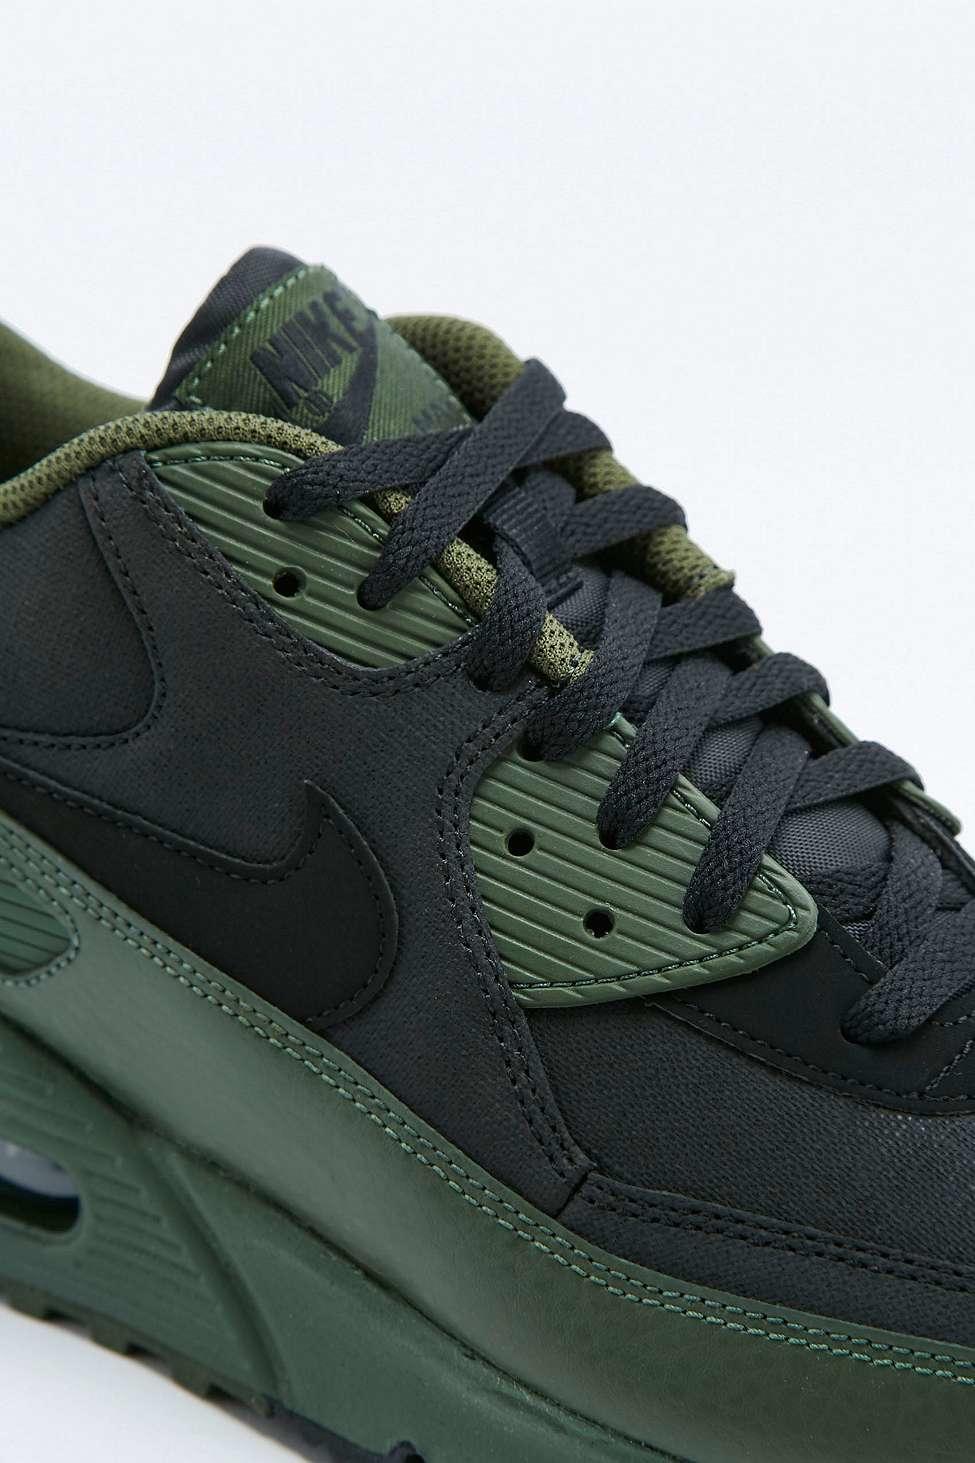 Nike Air Max 90 Winter Premium Khaki Trainers In Green For